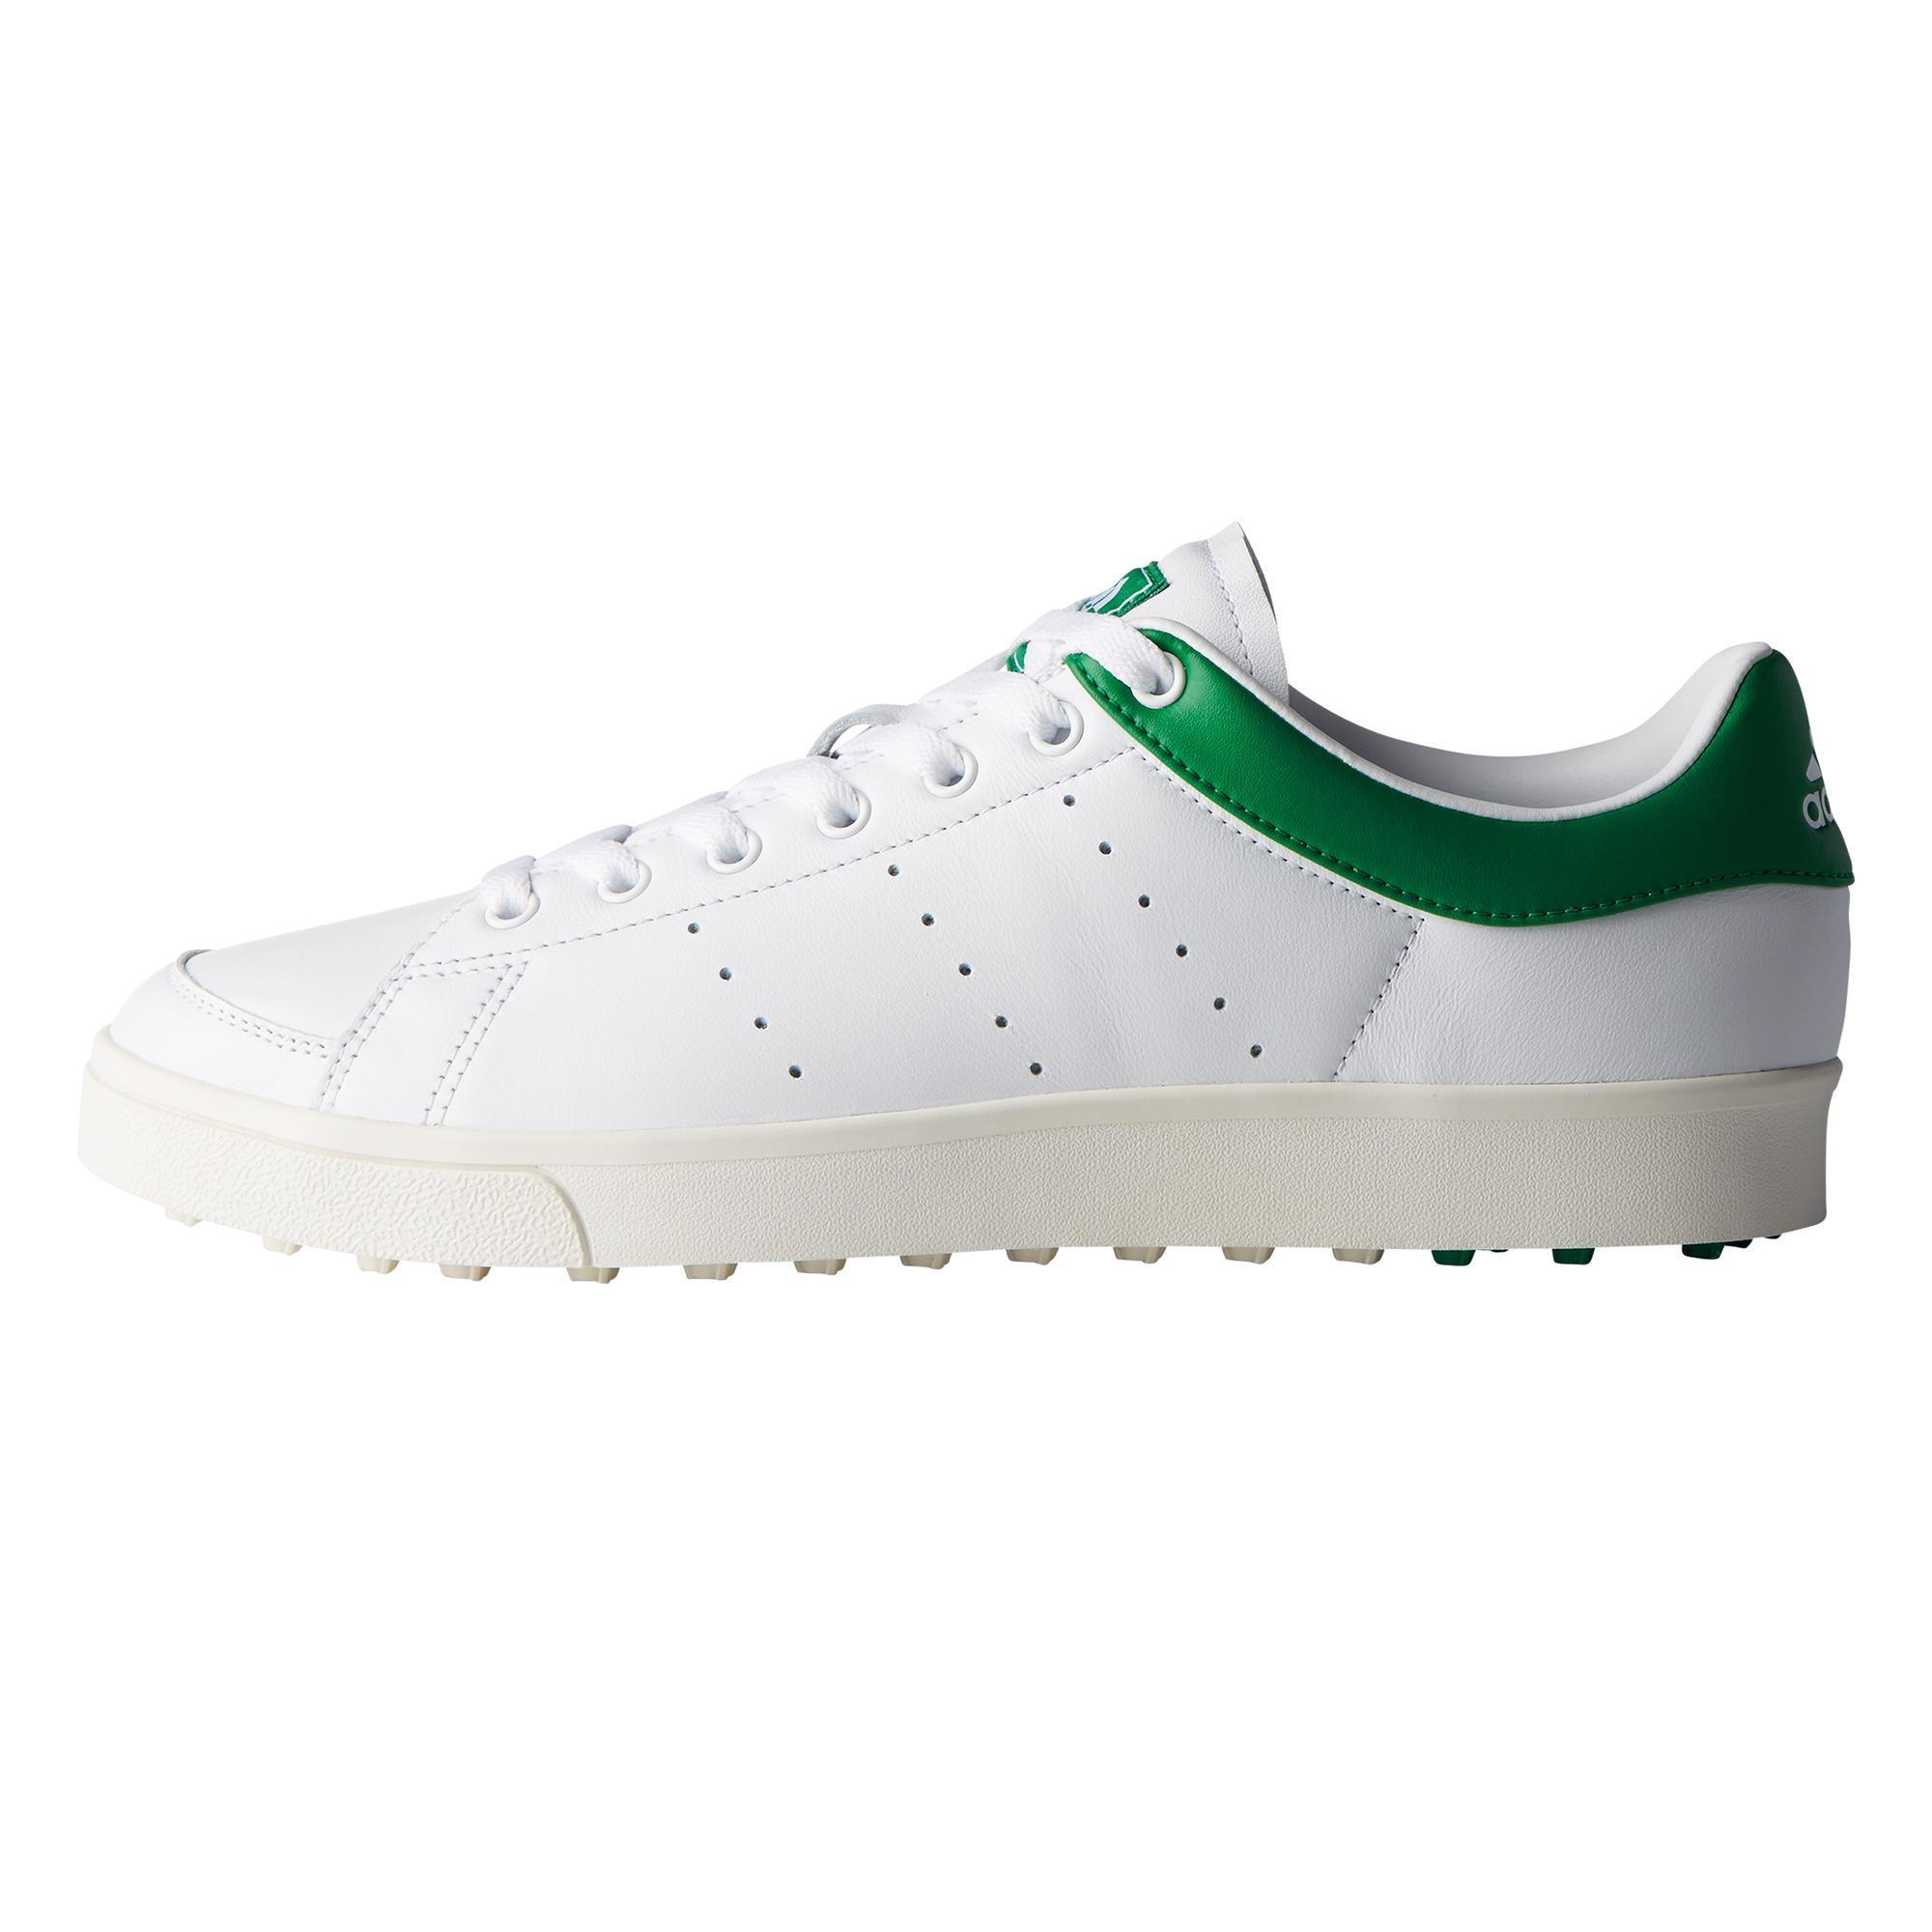 new styles 02025 15e67 Adidas Golfschoenen Adicross Classic voor heren wit